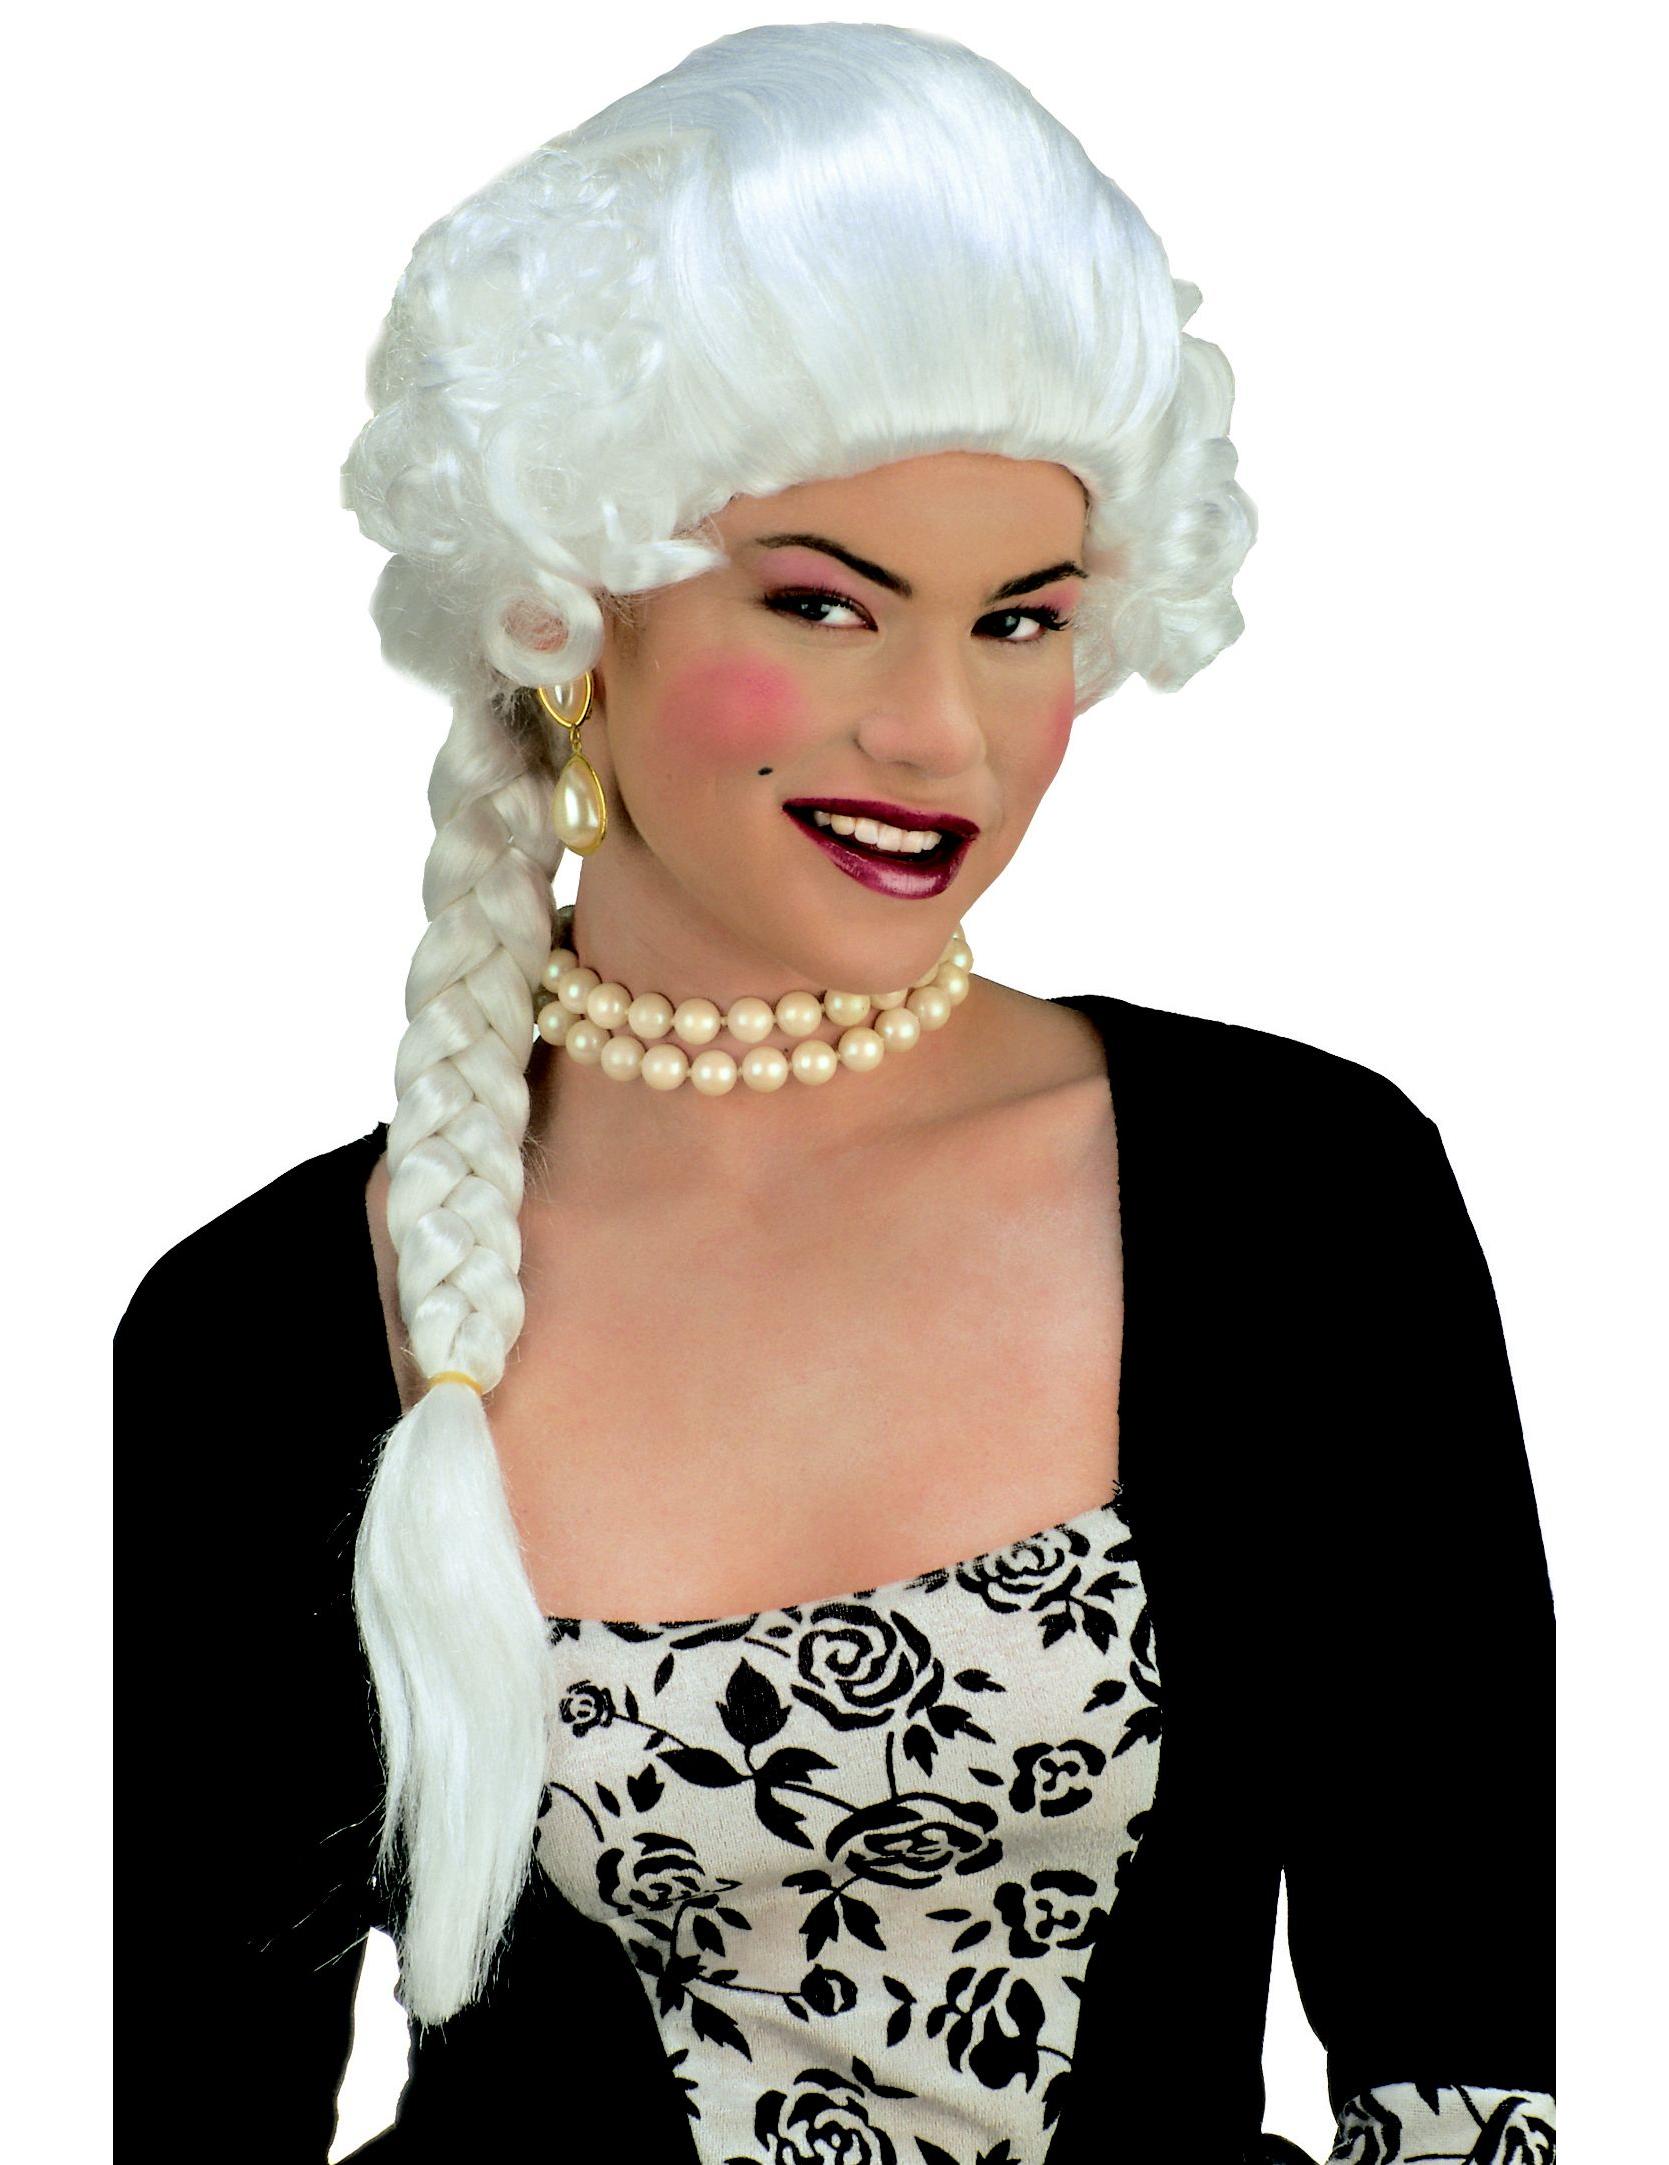 Perruque duchesse femme : Deguise-toi, achat de Perruques